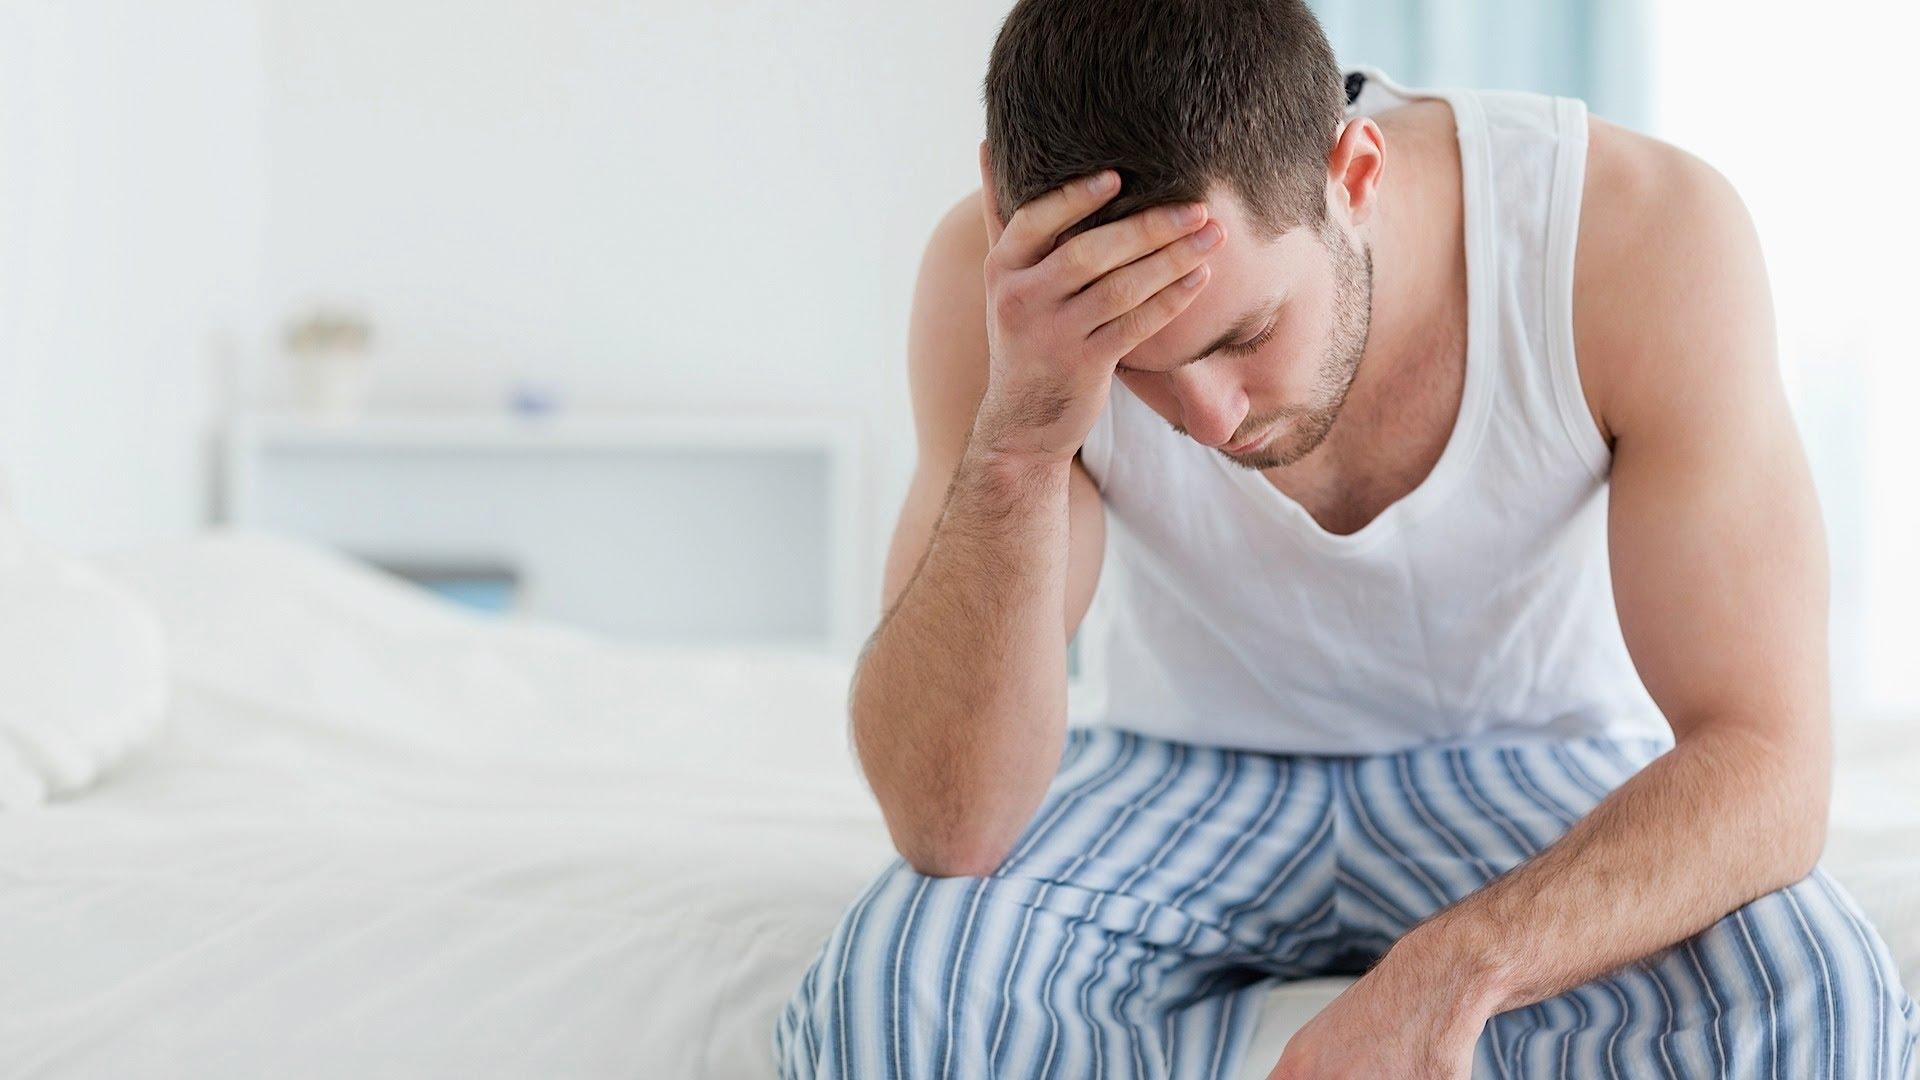 testicularcancertreatmentoptions.jpg